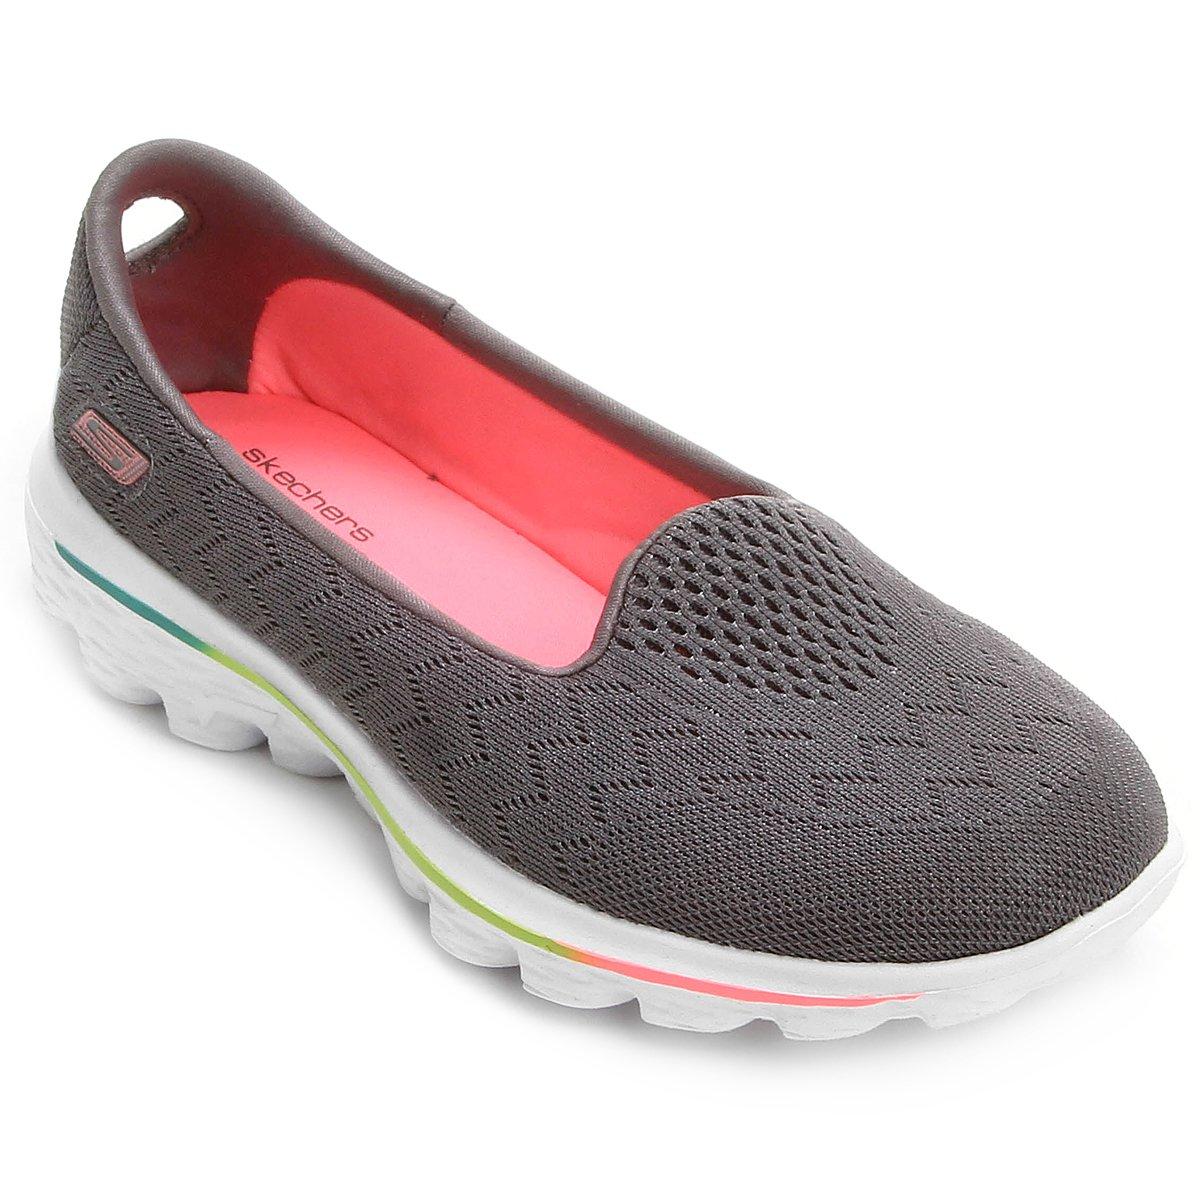 06edfe92736 Sapatilha Skechers Go Walk 2 Axis Infantil - Compre Agora